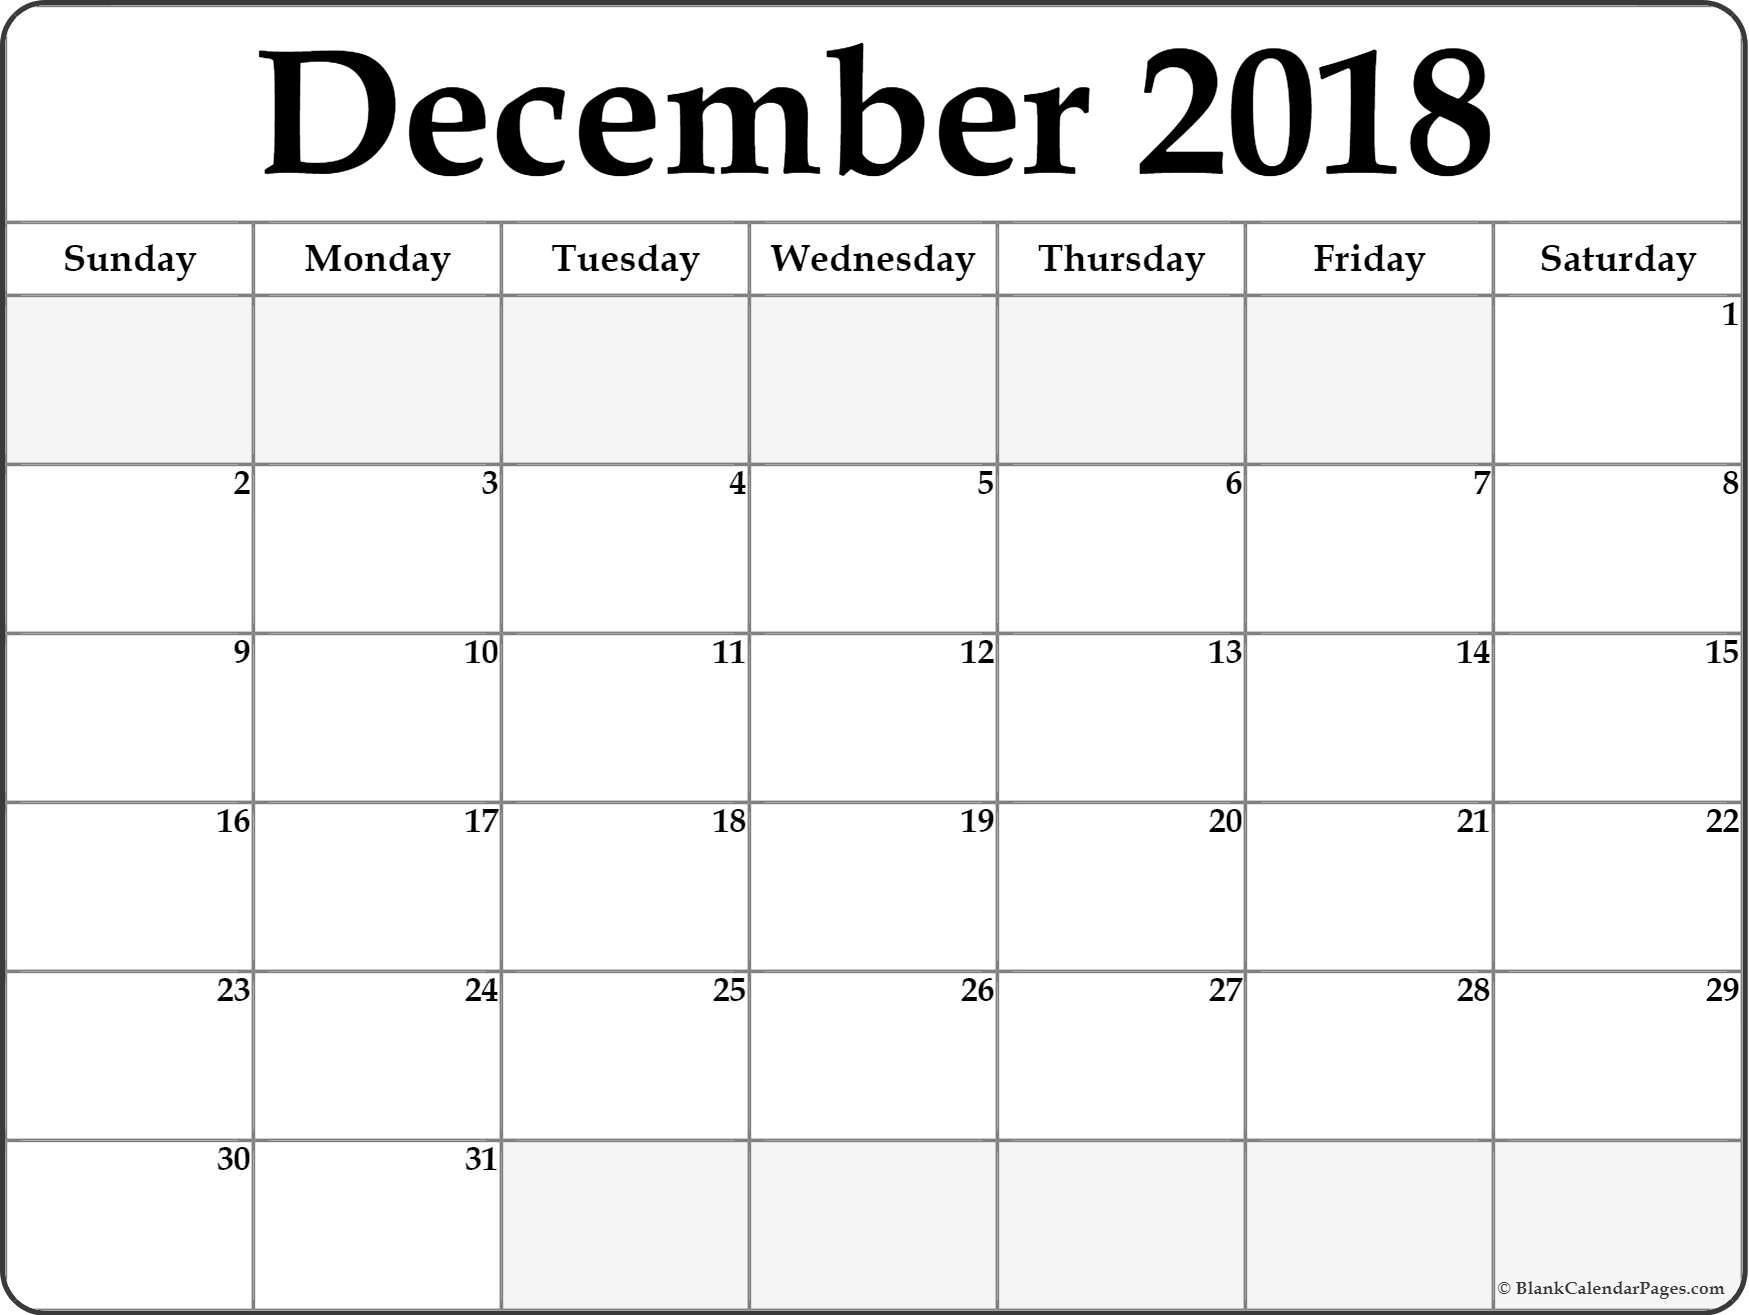 December 2018 Blank Calendar . December 2018 Calendar Printable with regard to December Blank Calendar Page Printable